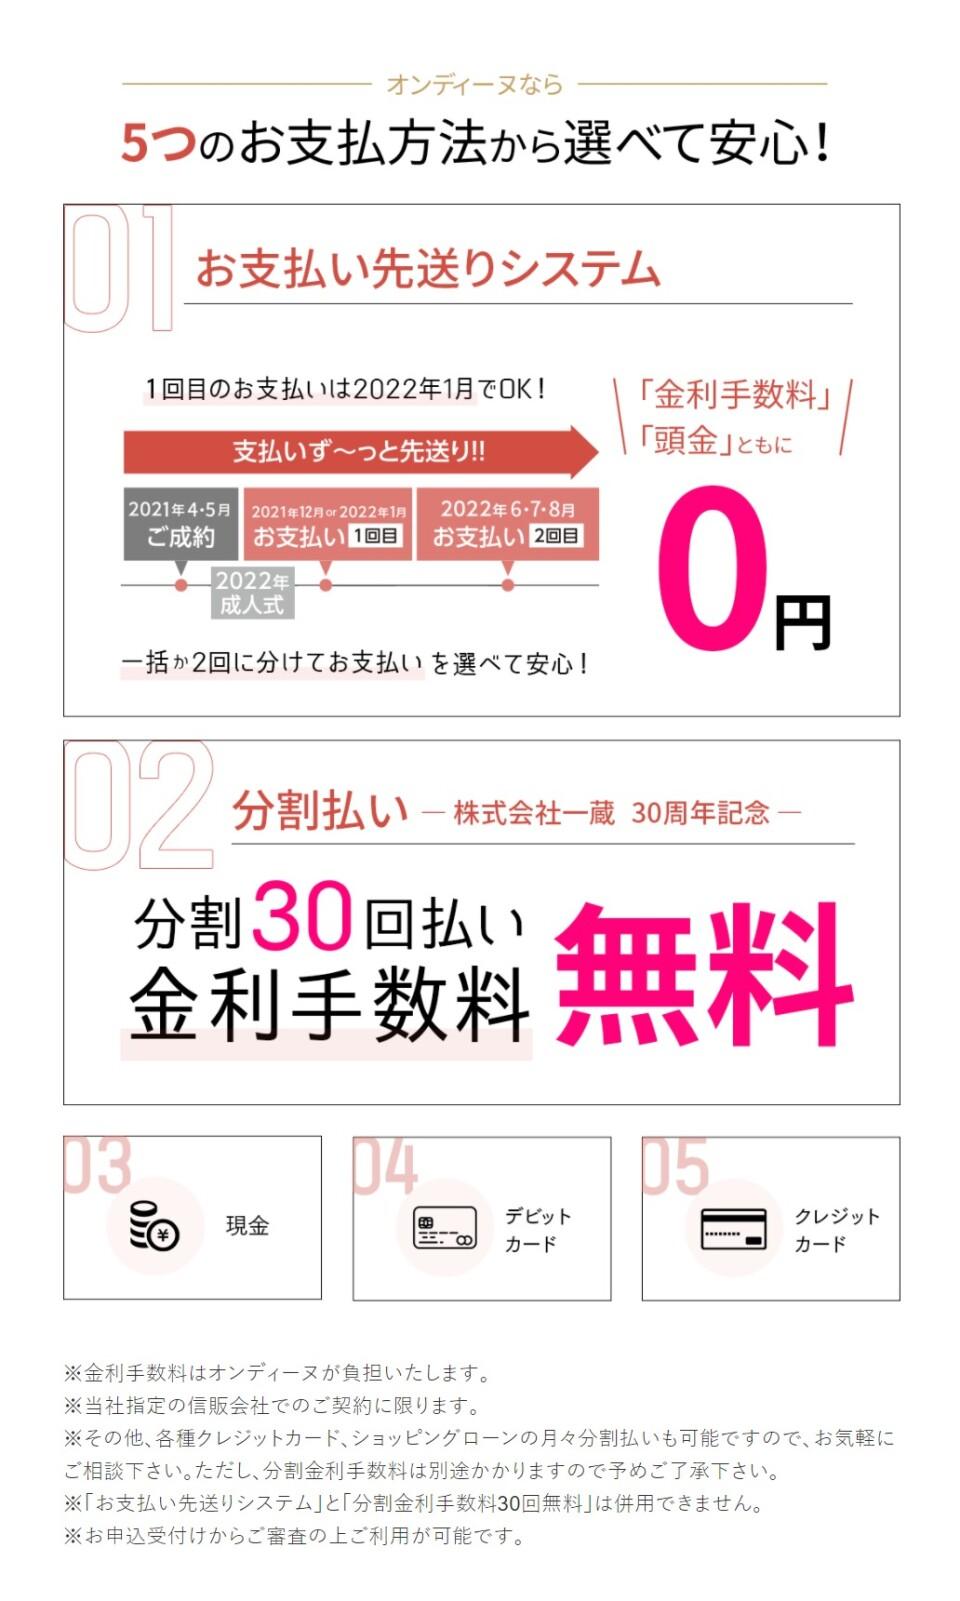 FireShot Capture 4778 - オンディーヌ各店周年祭|成人式の振袖レンタル・販売オンディーヌ - www.ondine.jp